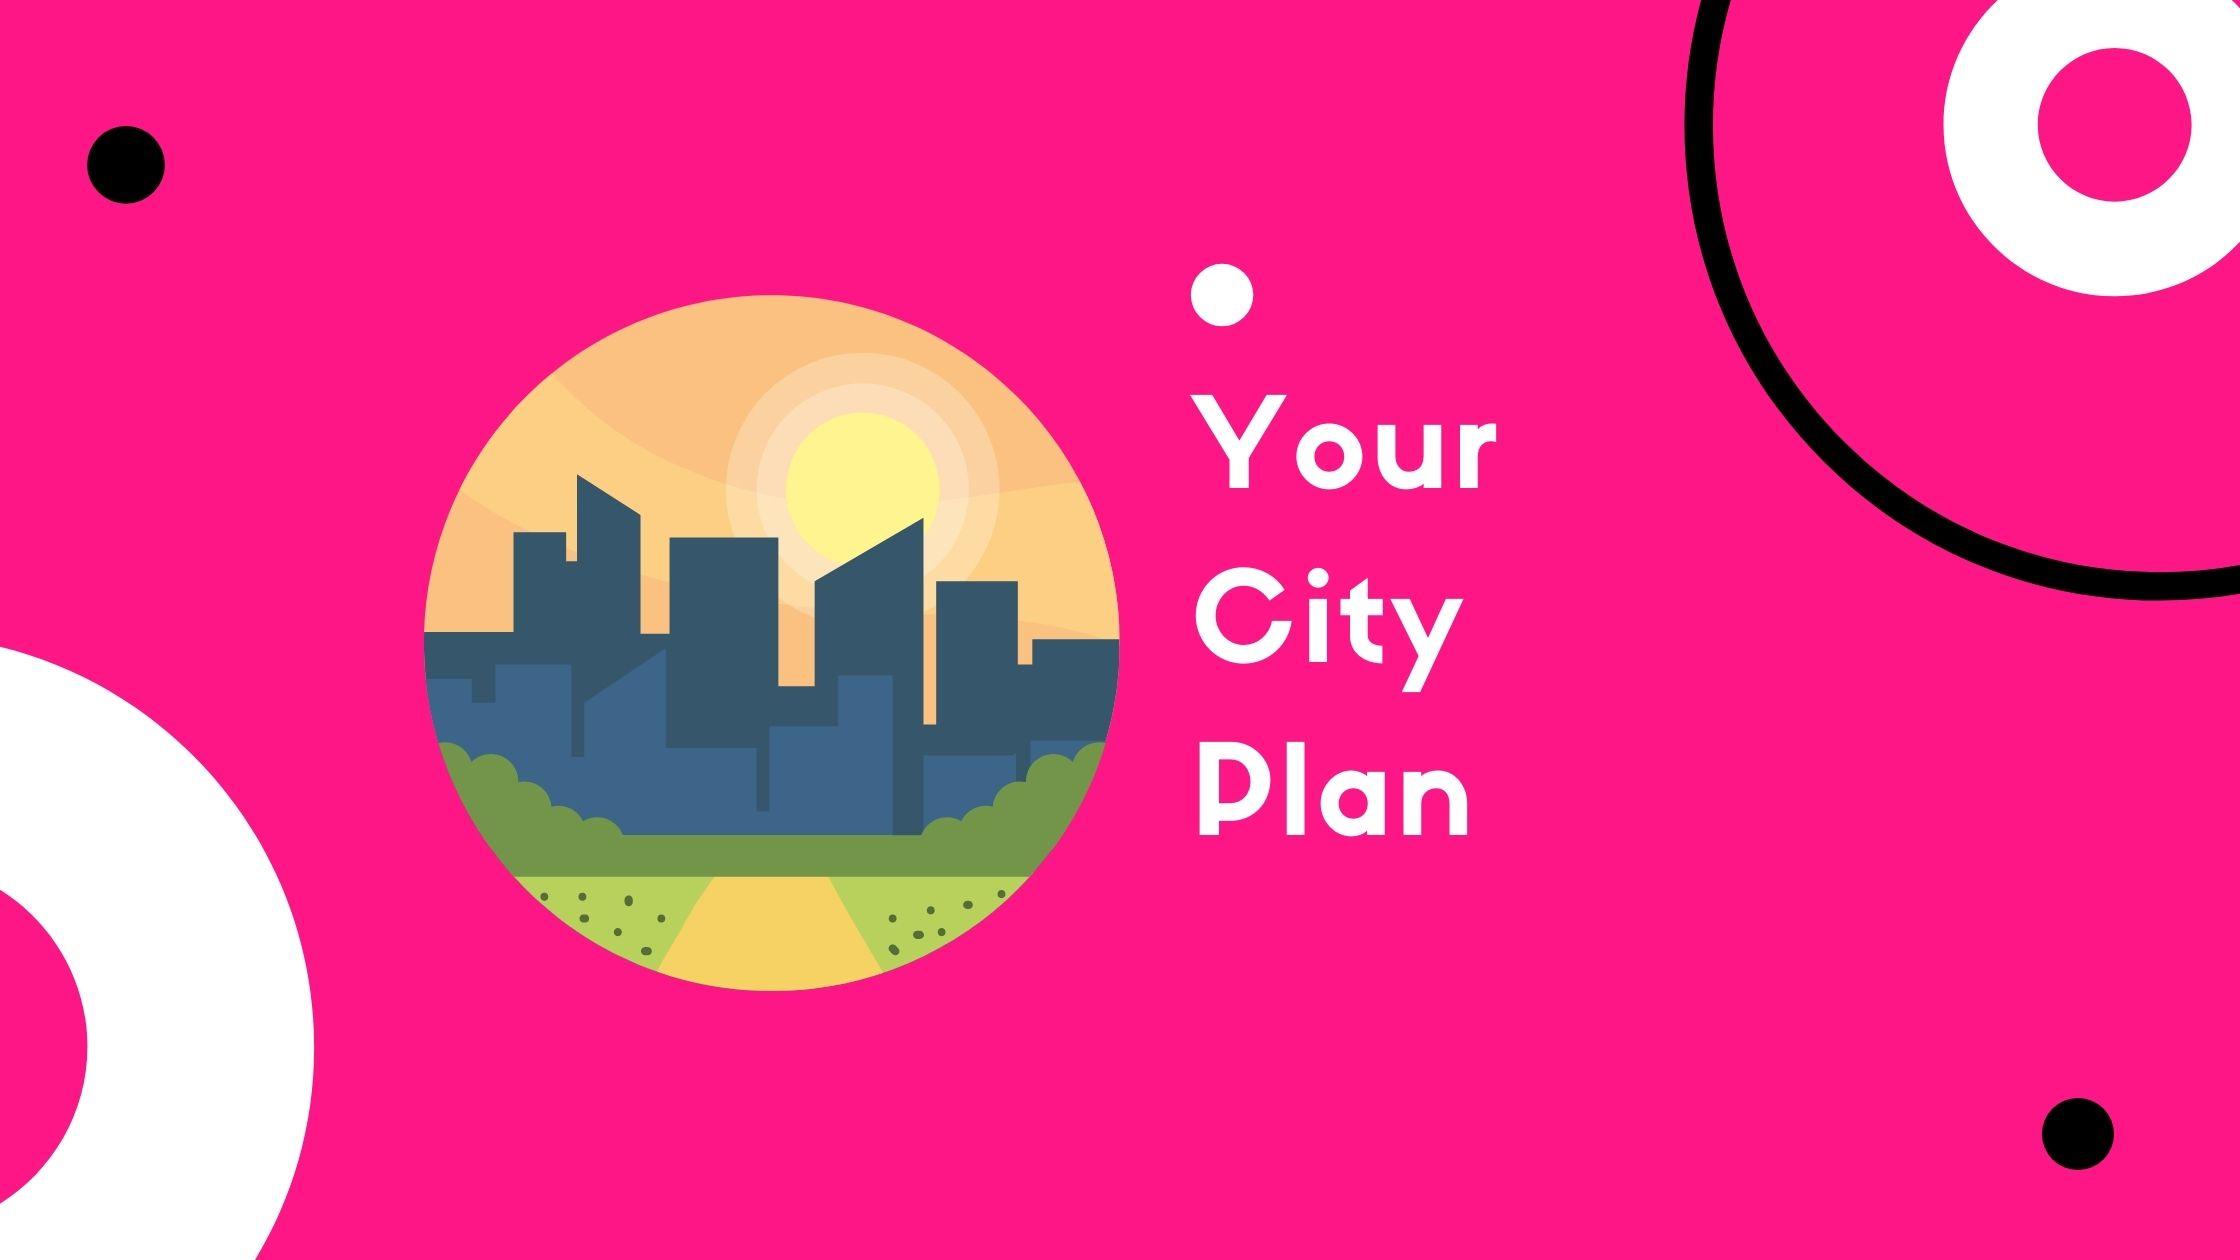 Your City Plan - Health Portal US